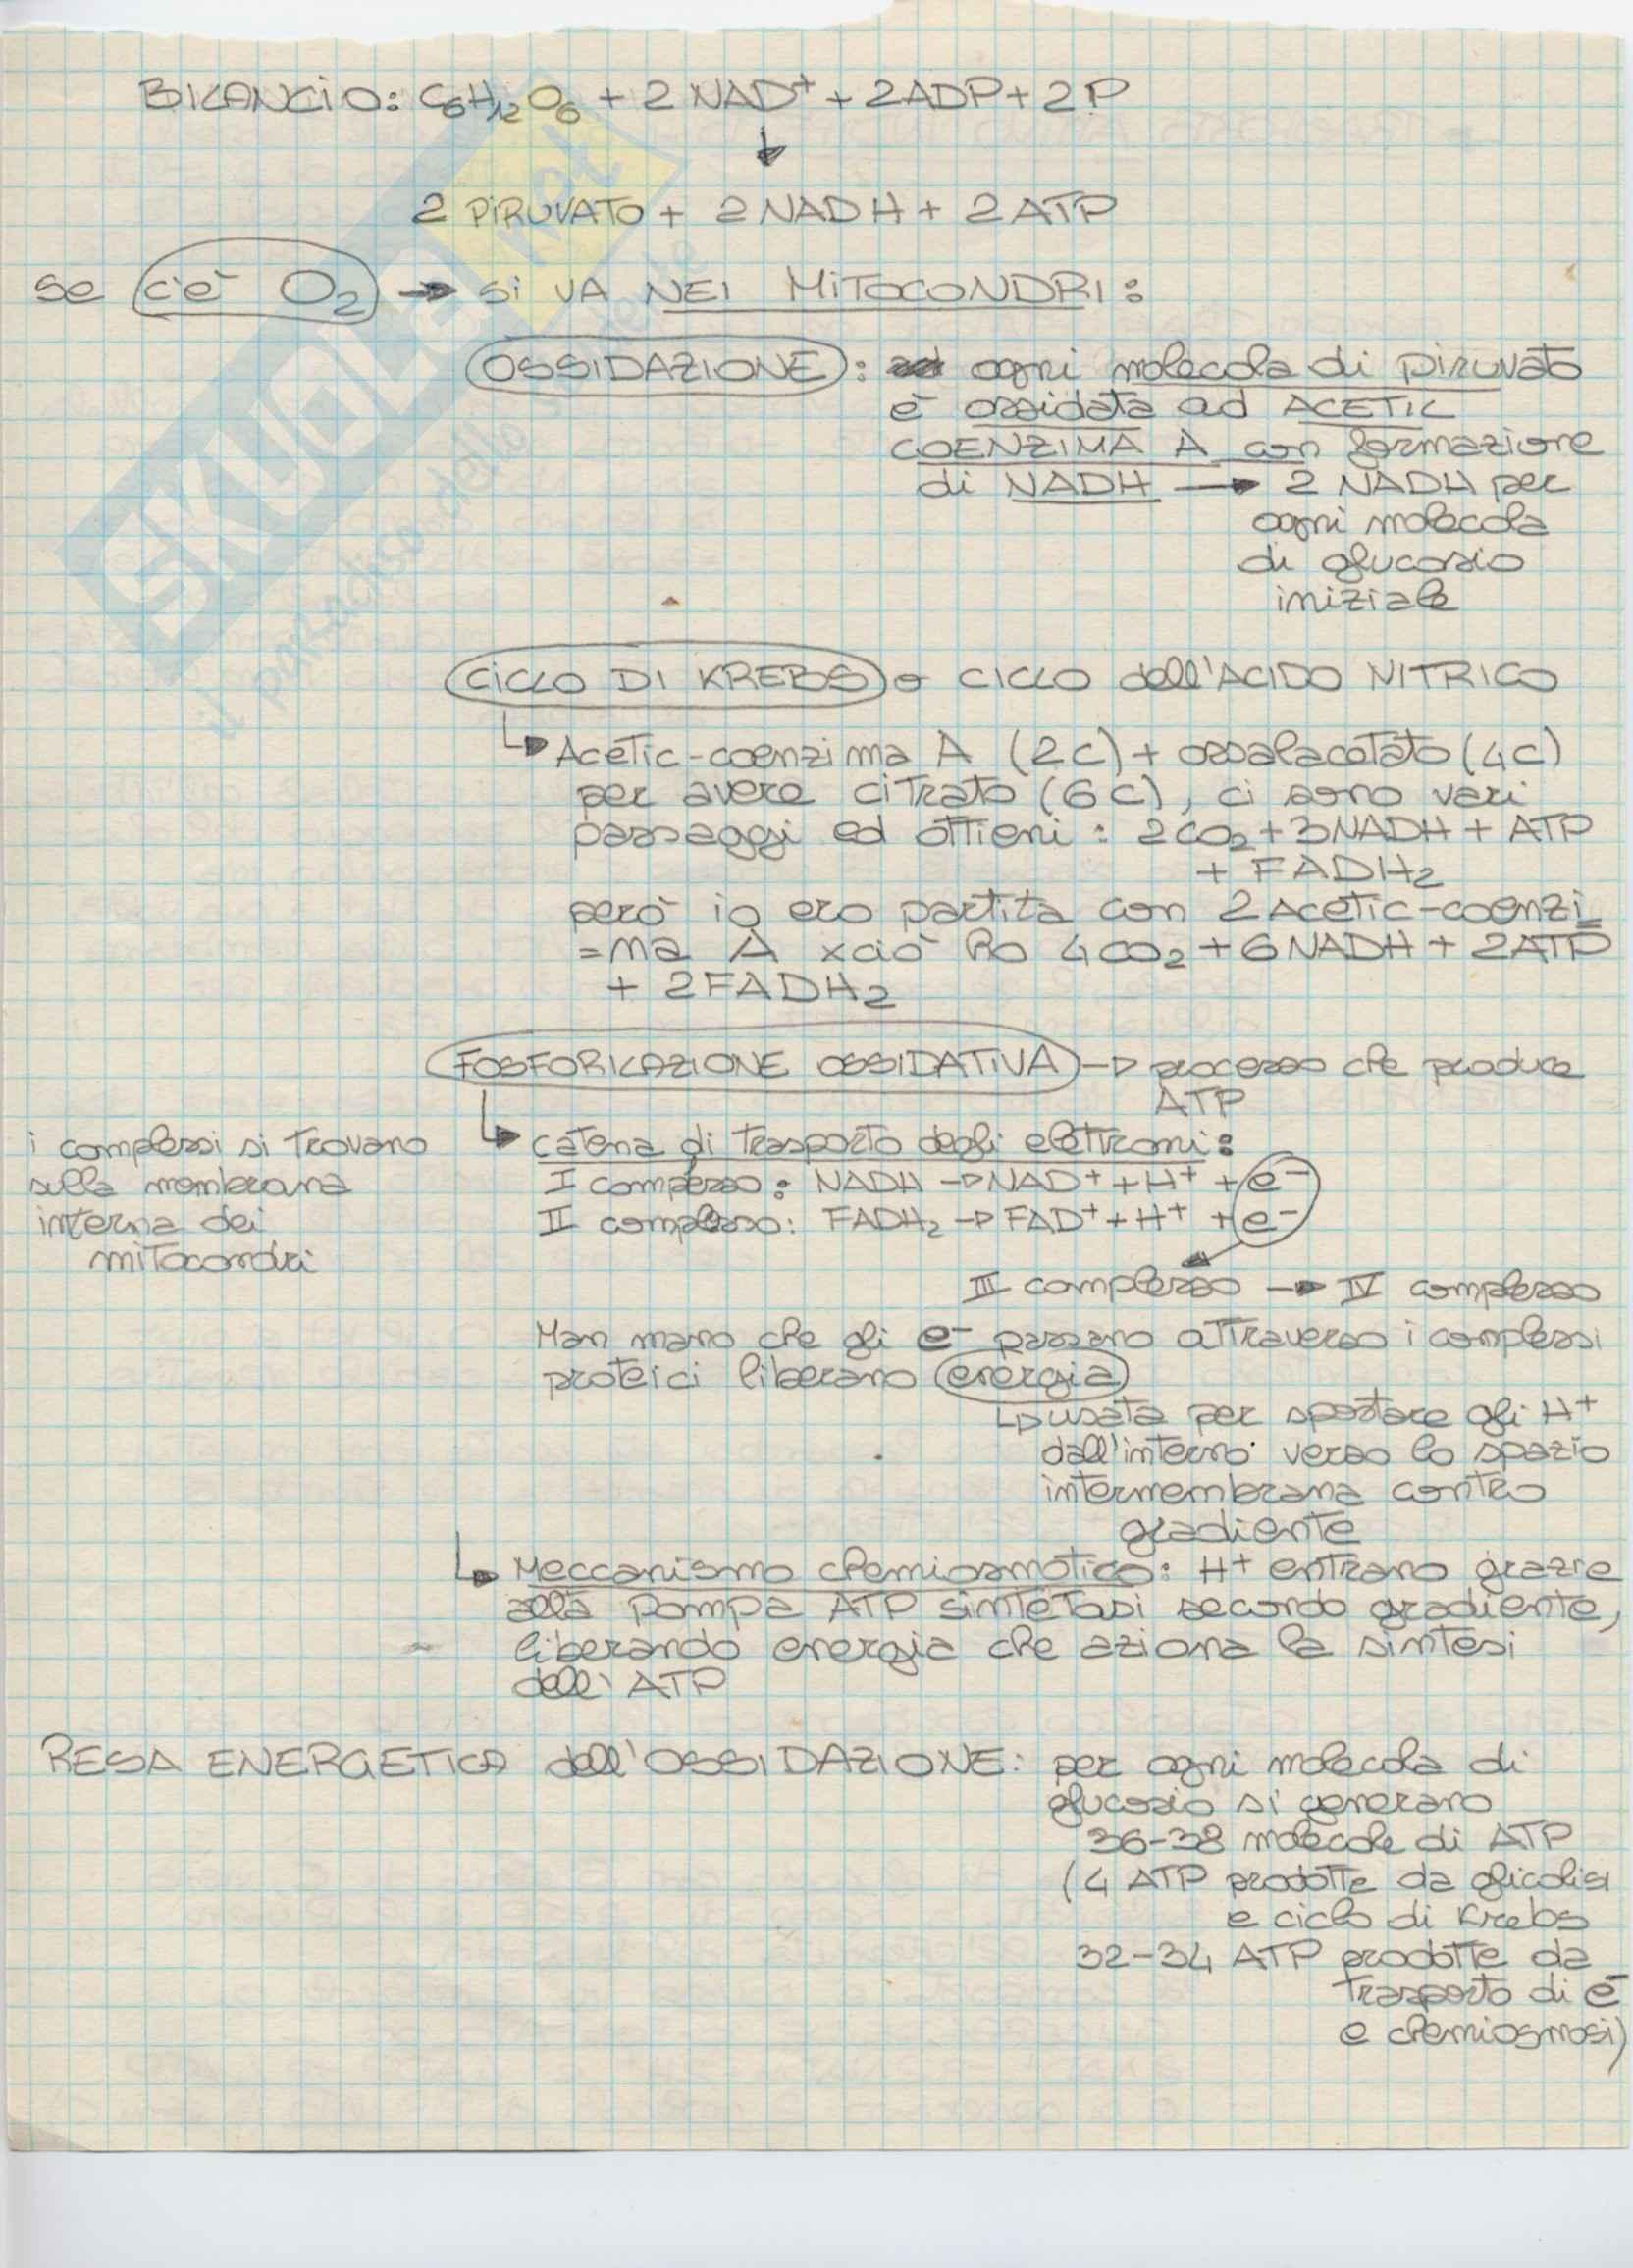 Biologia animale - Appunti parte 2 Pag. 6